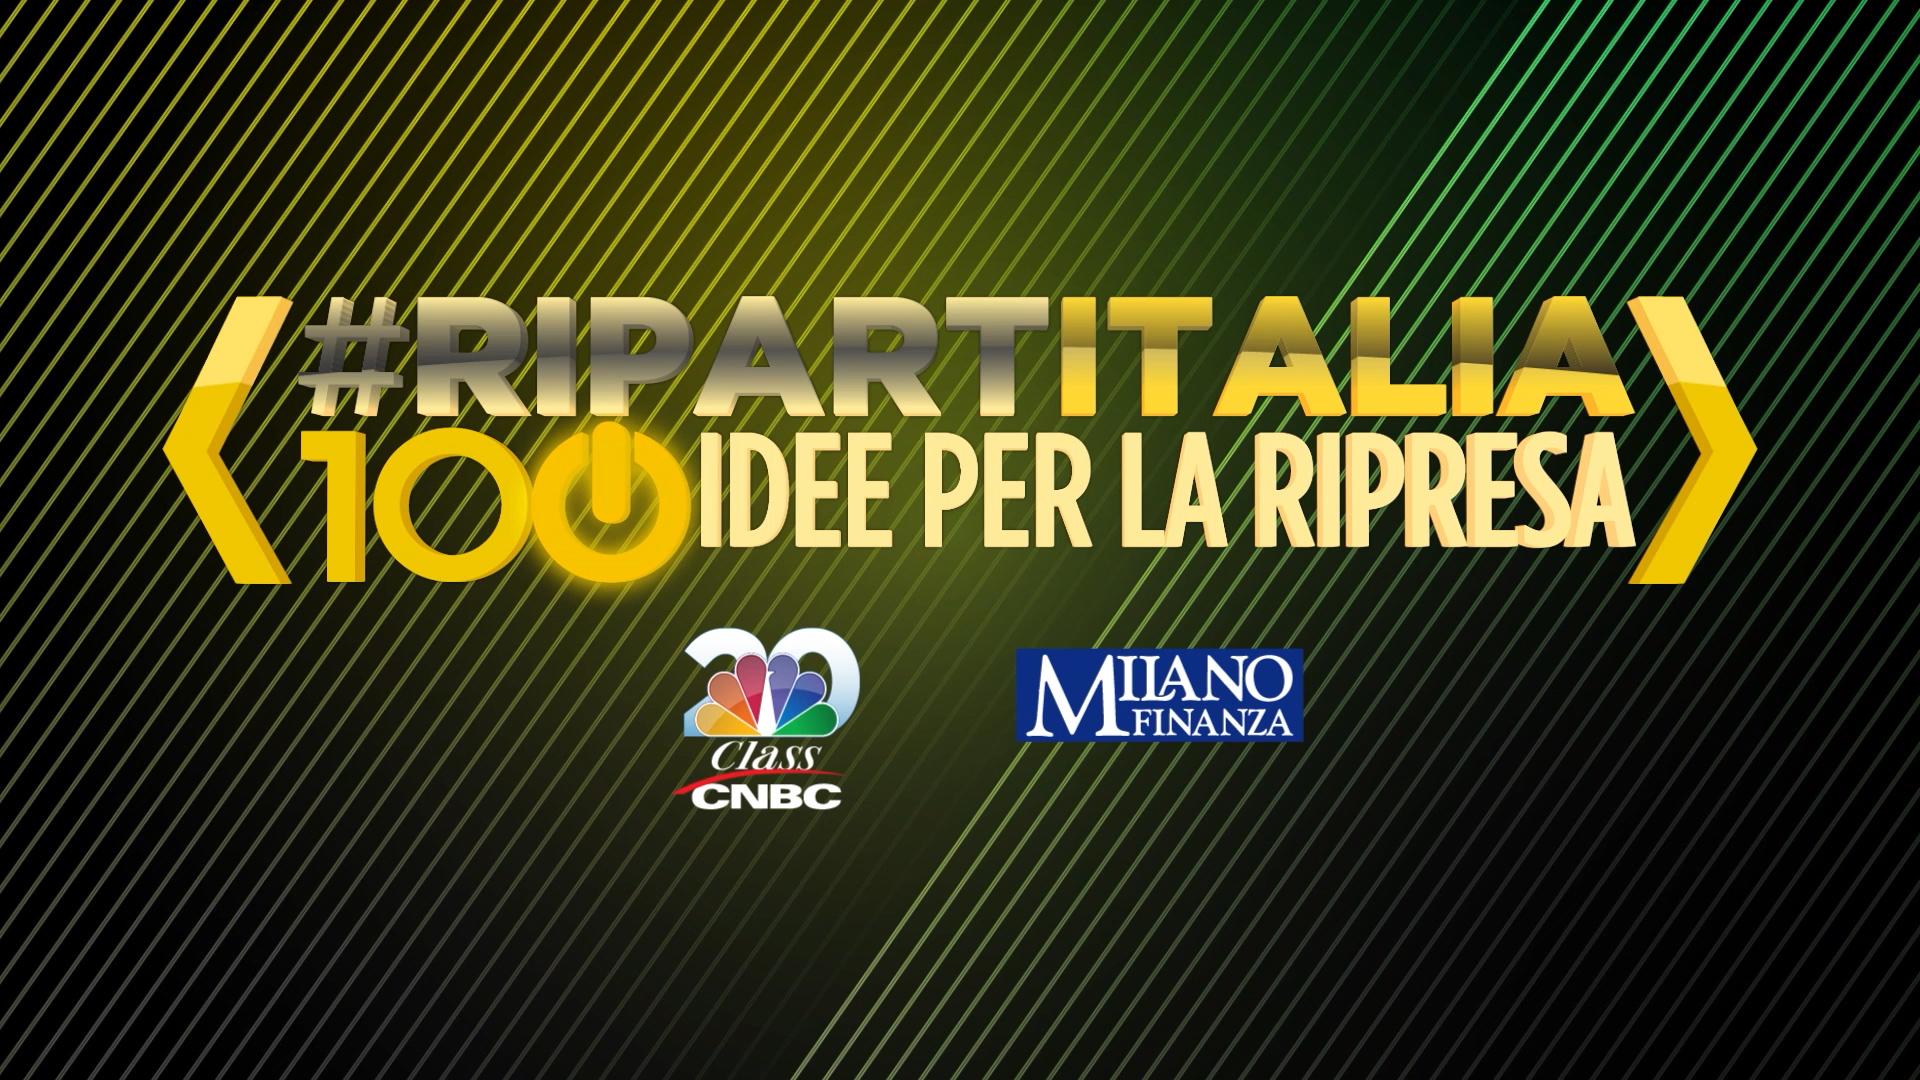 #RIPARTITALIA 2020